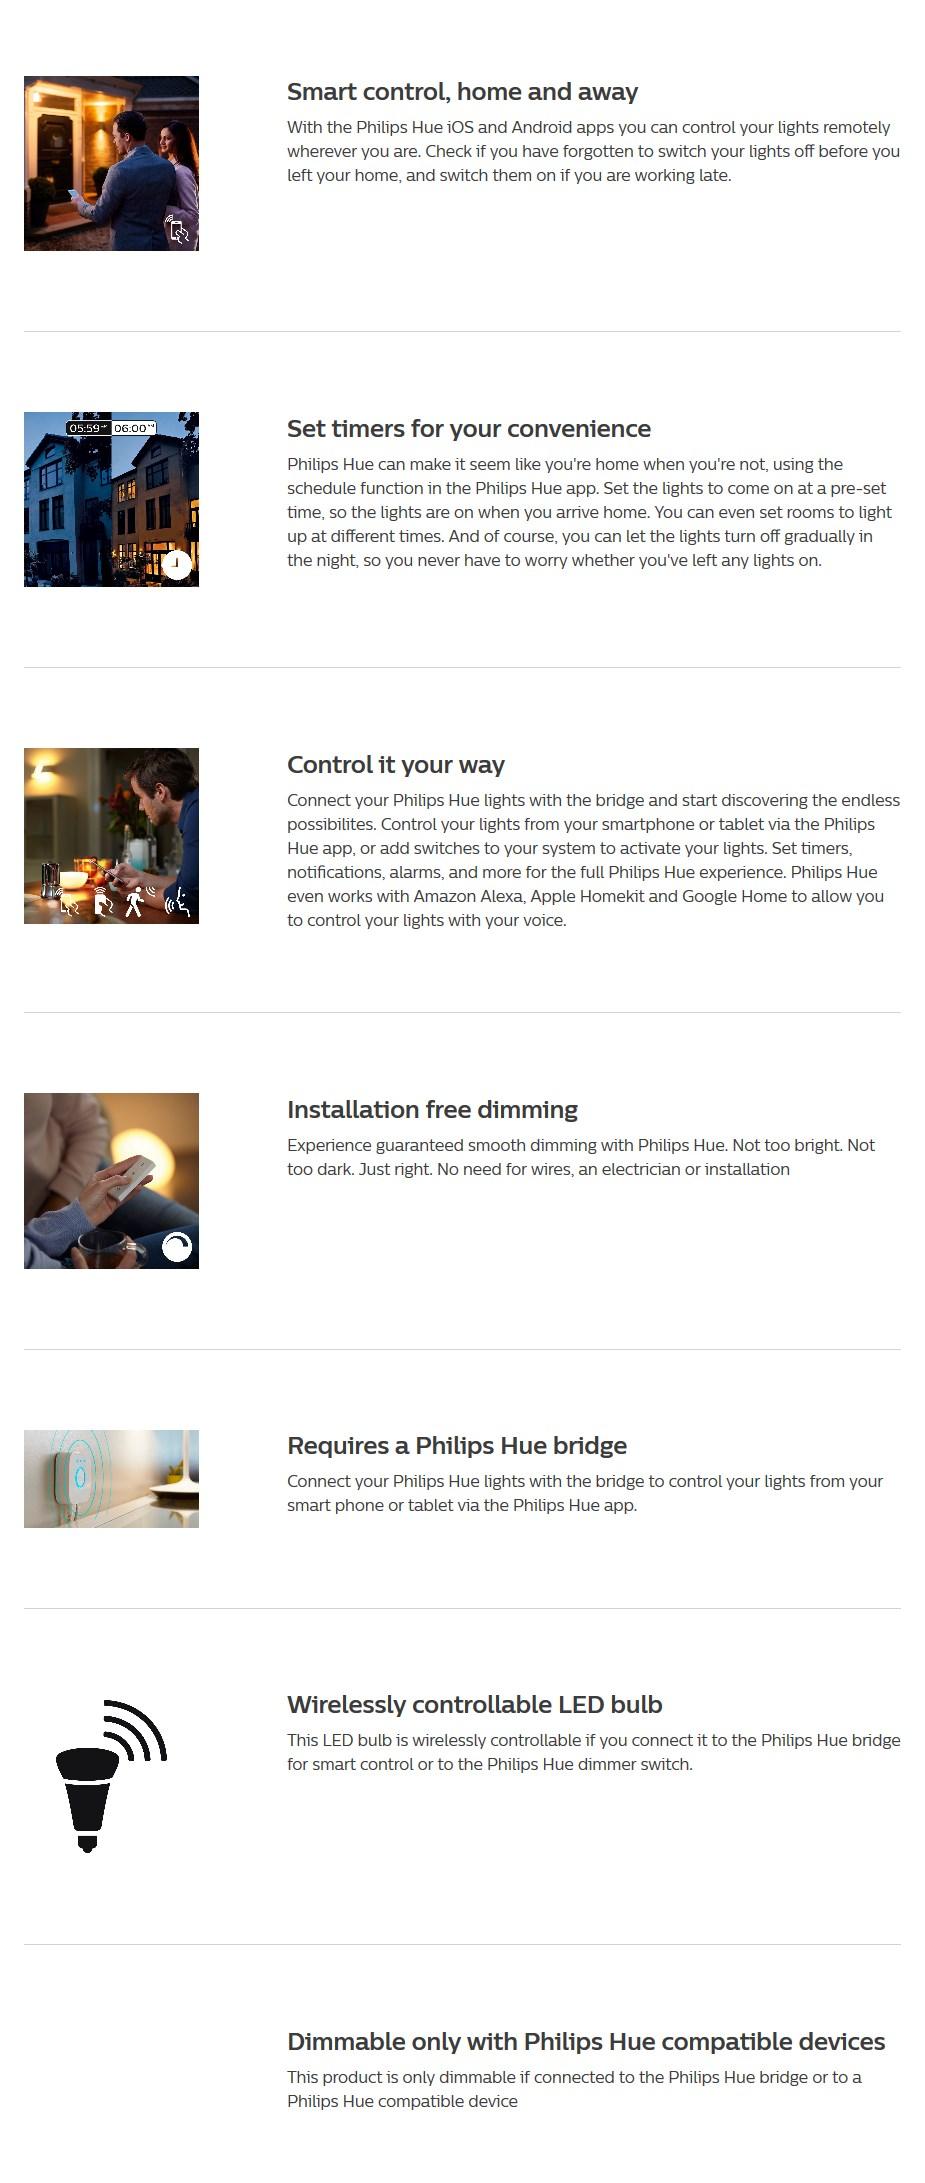 Philips Hue White LED Smart Bulb - Bayonet Clip - Desktop Overview 1